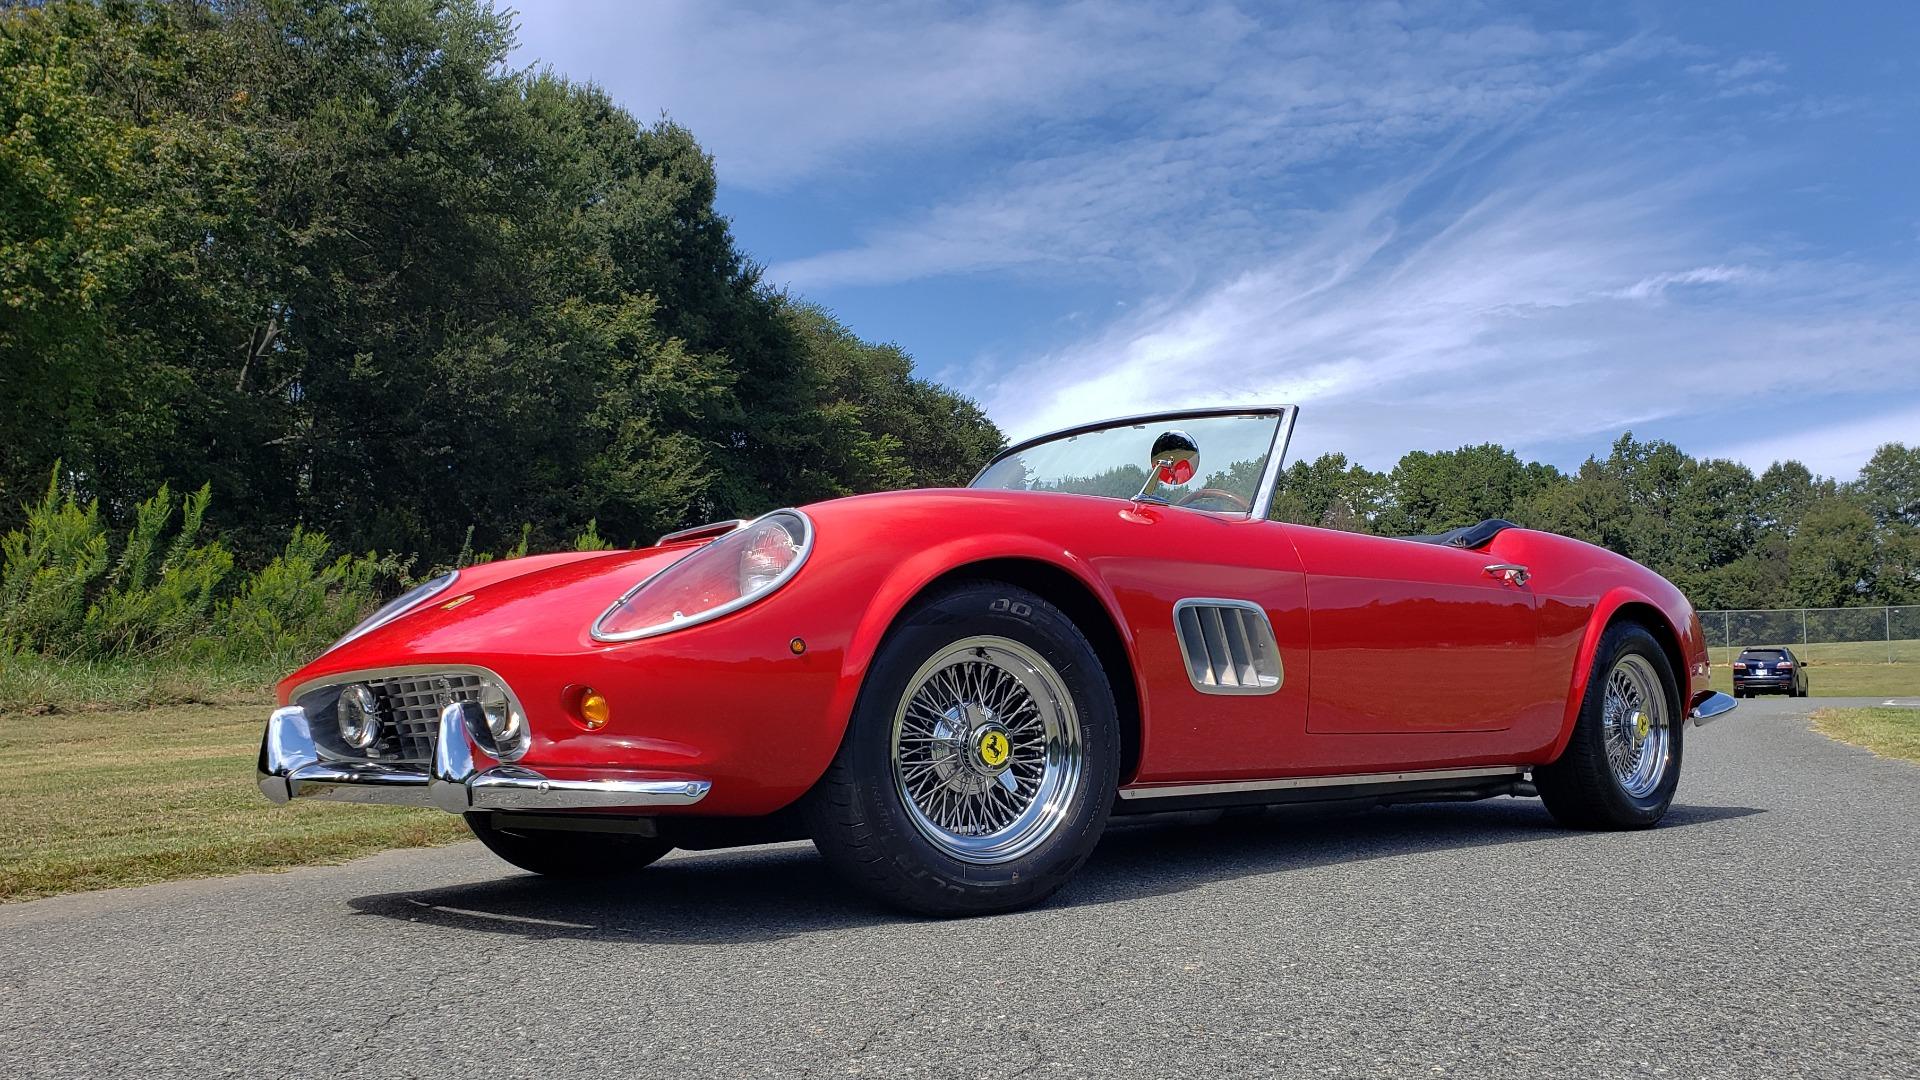 Used 1961 Ferrari 250GT SWB CALIFORNIA REPLICA / 302CI V8 / TREMEC 5-SPEED for sale Sold at Formula Imports in Charlotte NC 28227 2